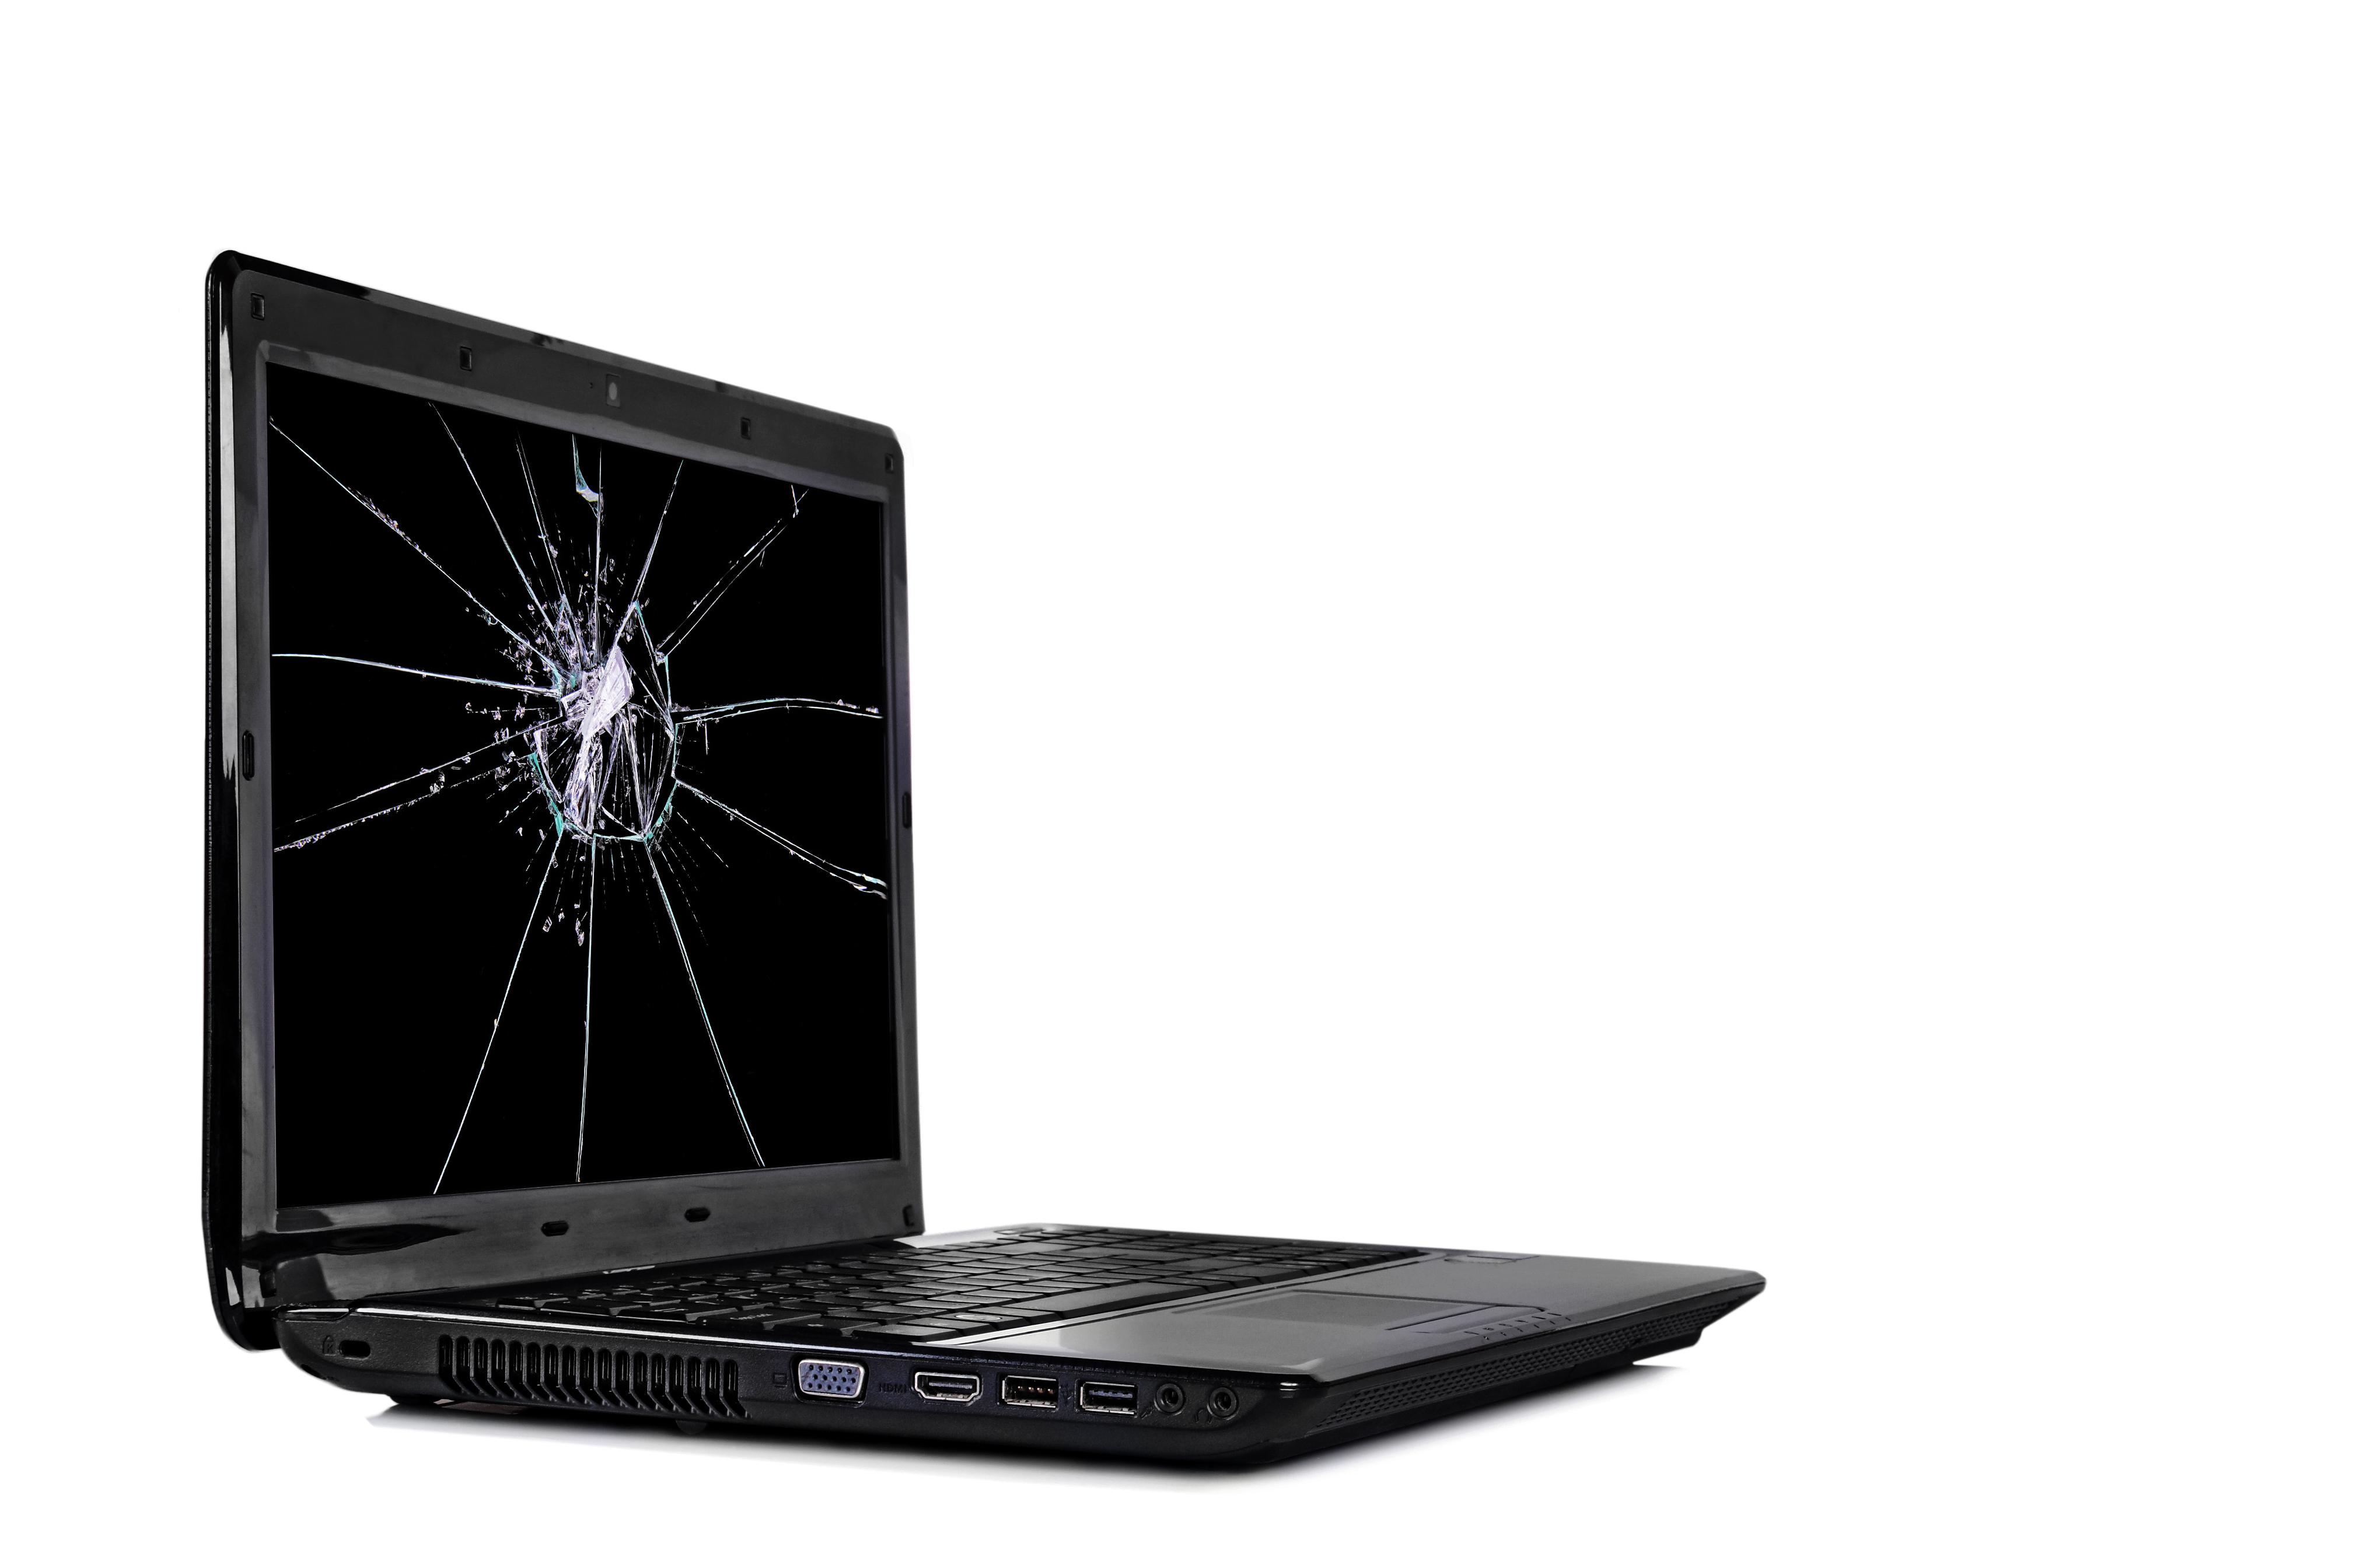 Sửa laptop tại Quận Thủ Đức Tp. HCM